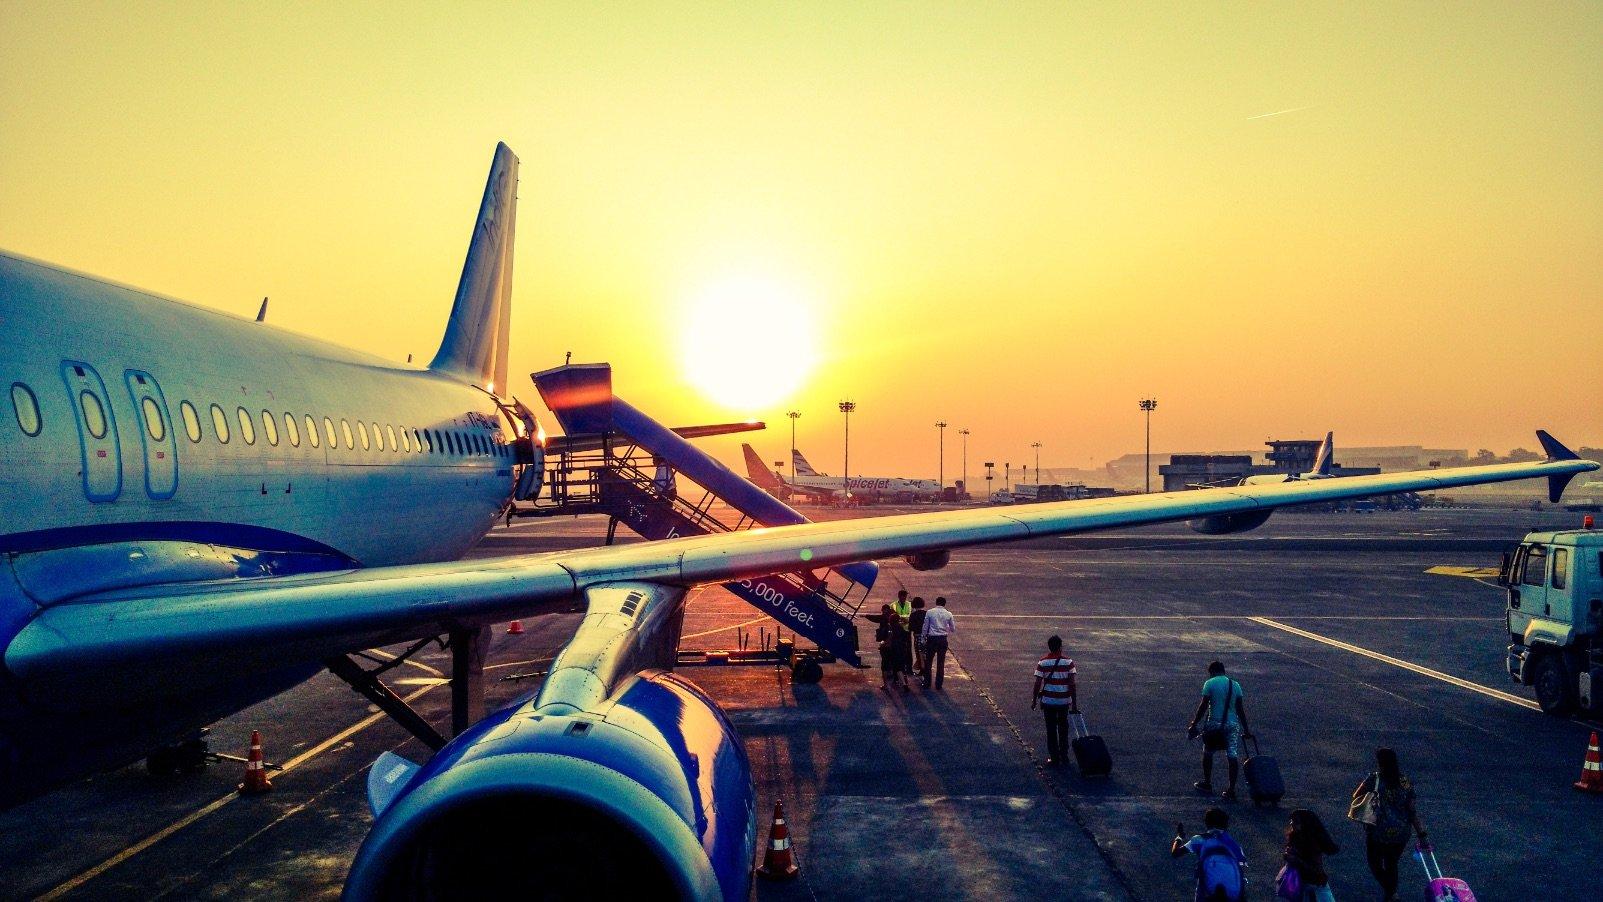 Aviation Health & Safety After Coronavirus